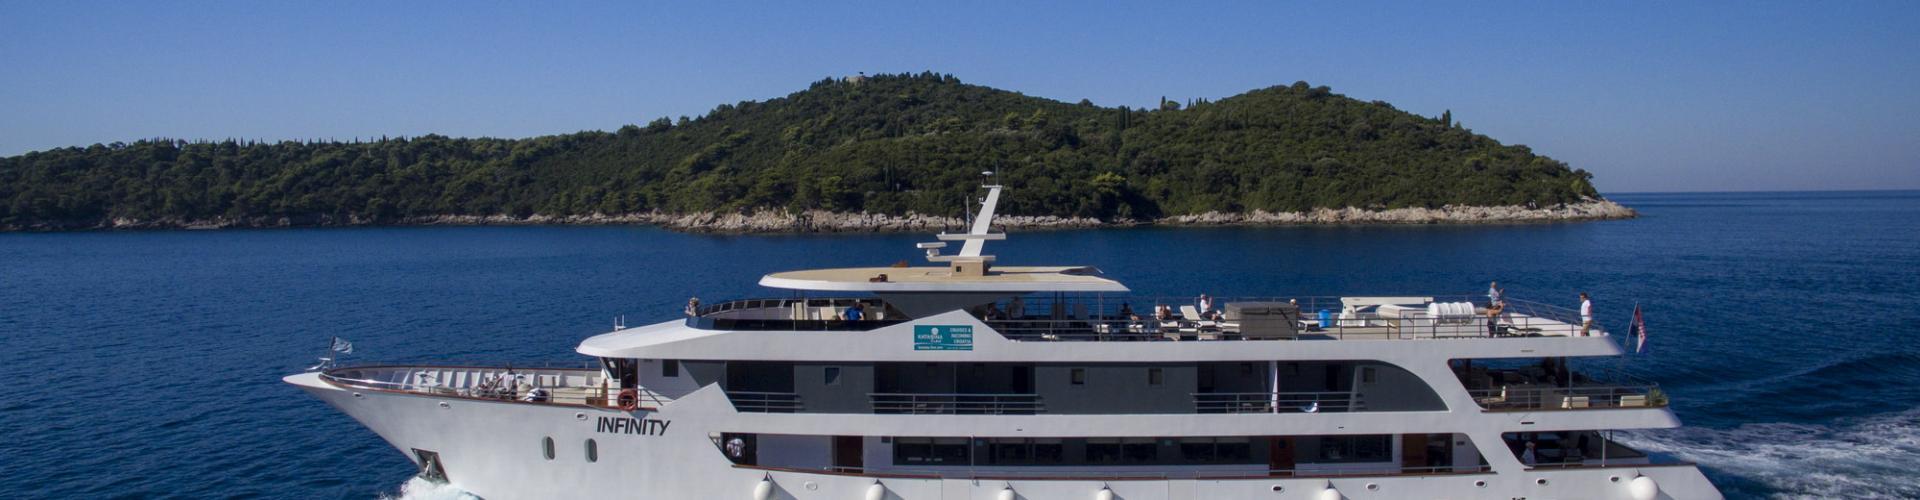 Deluxe Superior nave da crociera MV Infinity- yacht a motore